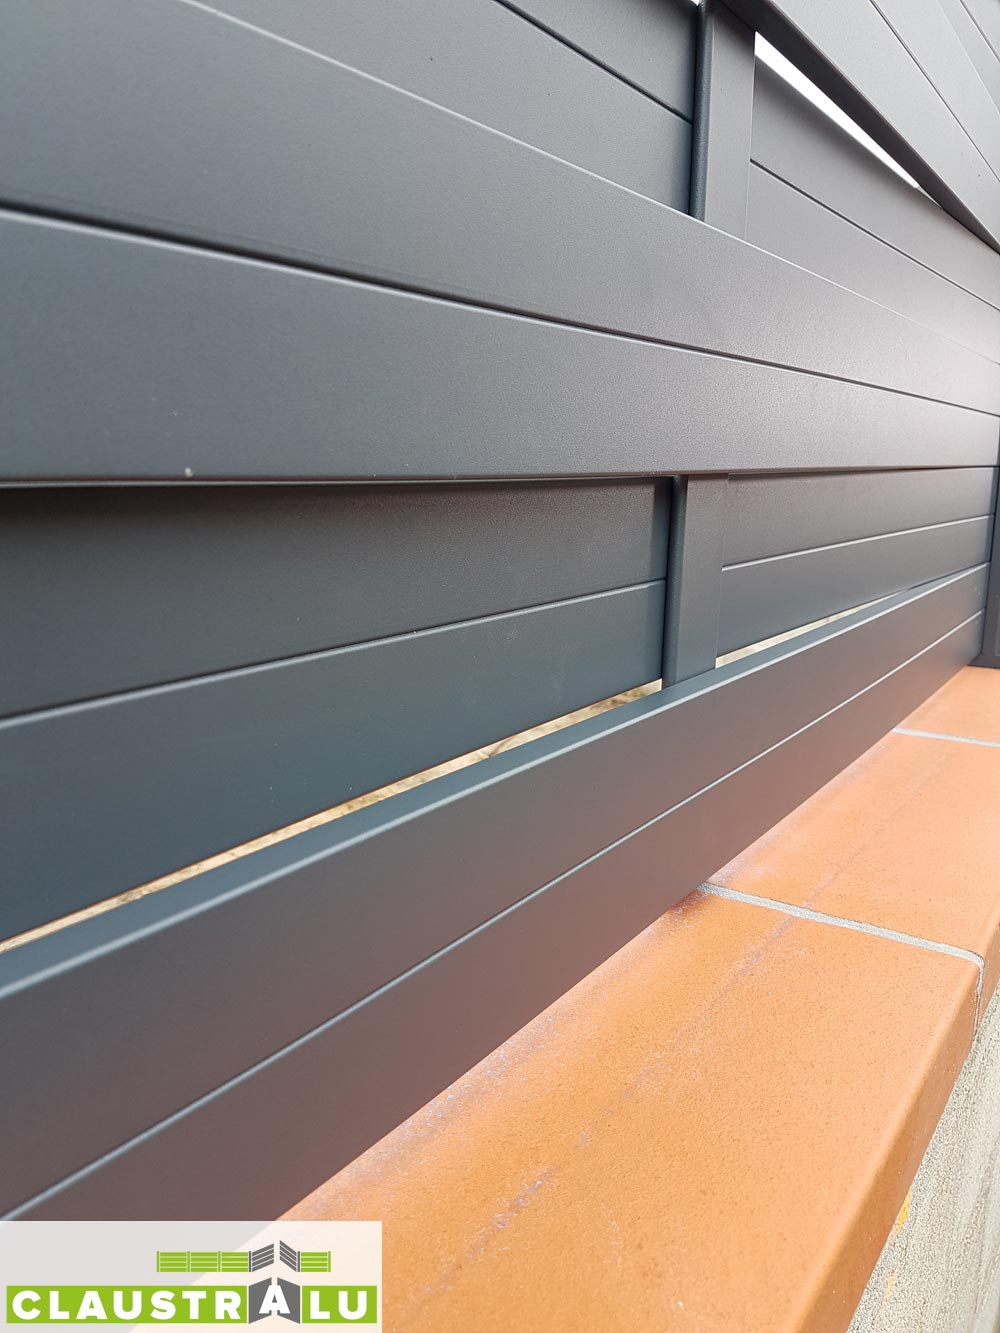 Brise vue en aluminium design tress pour cl turer un jardin for Cloture aluminium anthracite